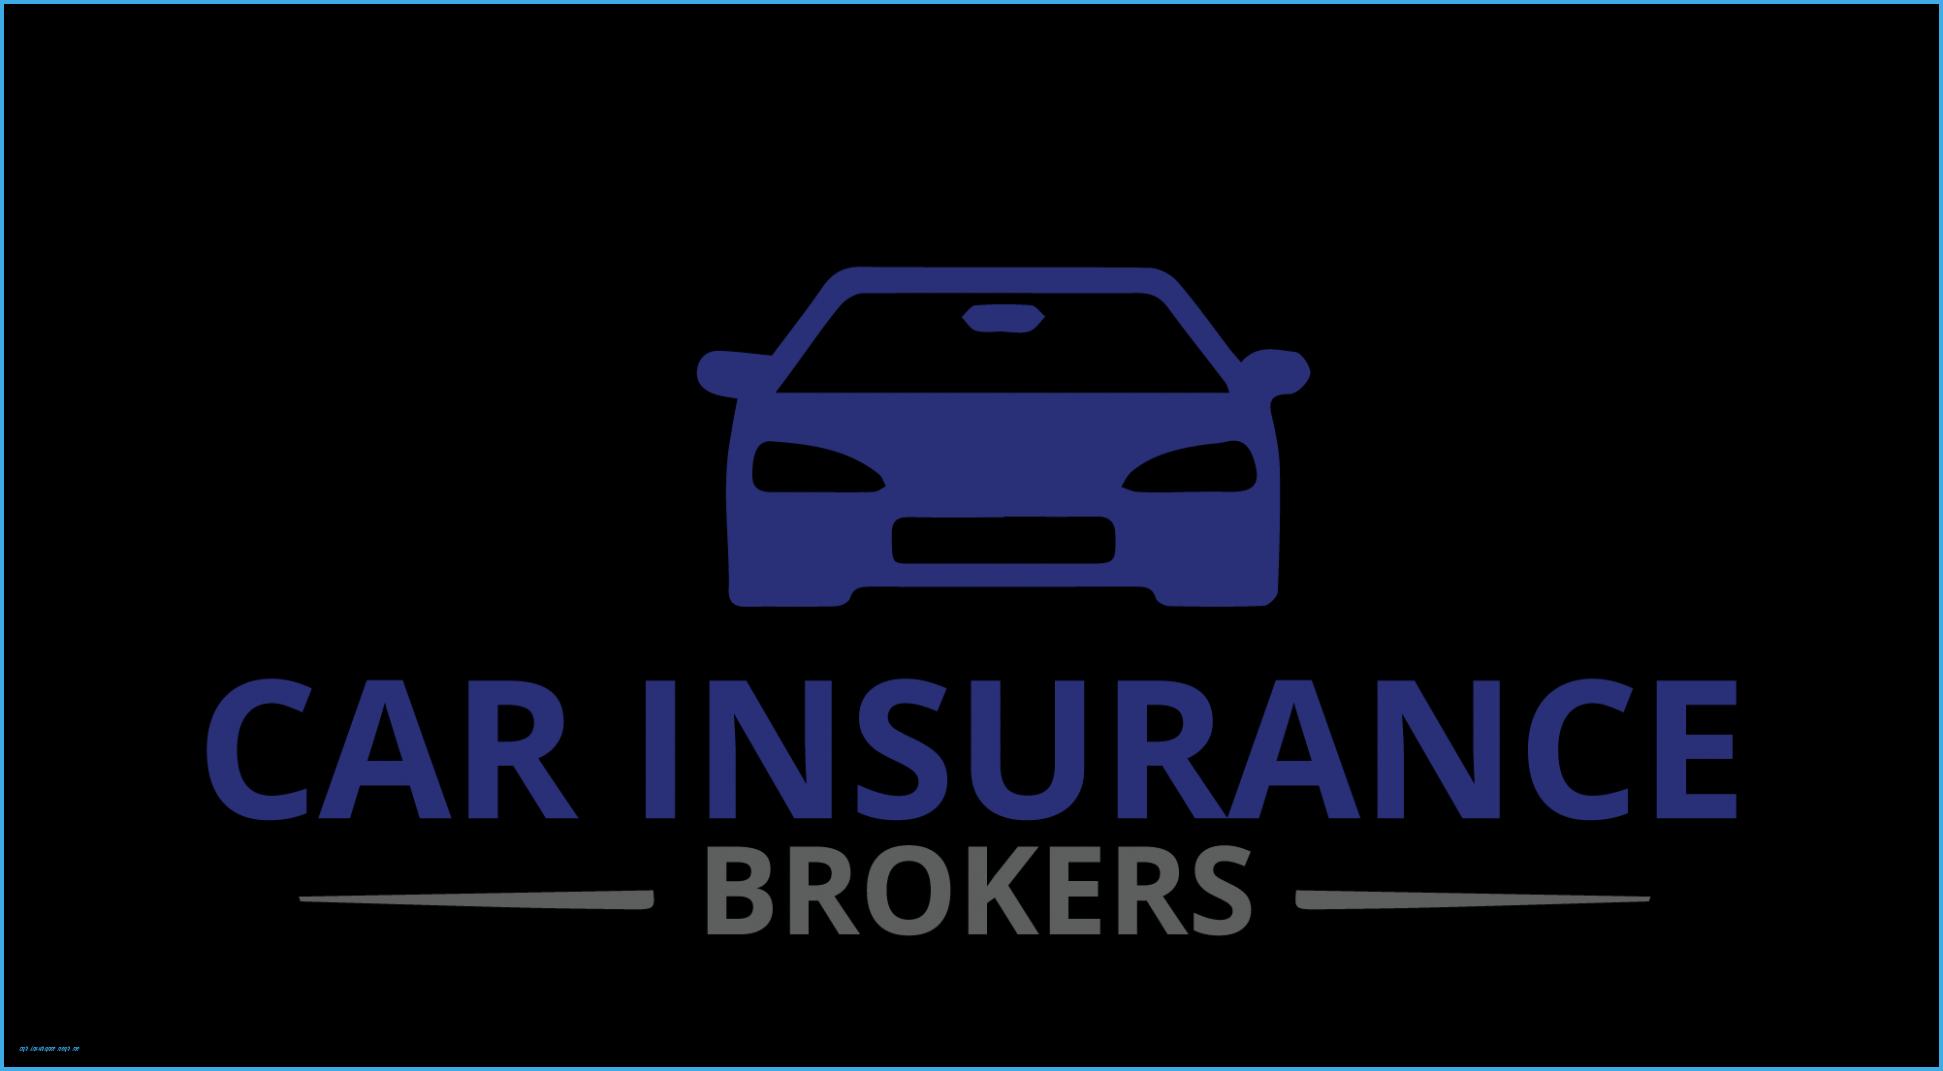 Insurance Agents Near Me Auto - INURANC